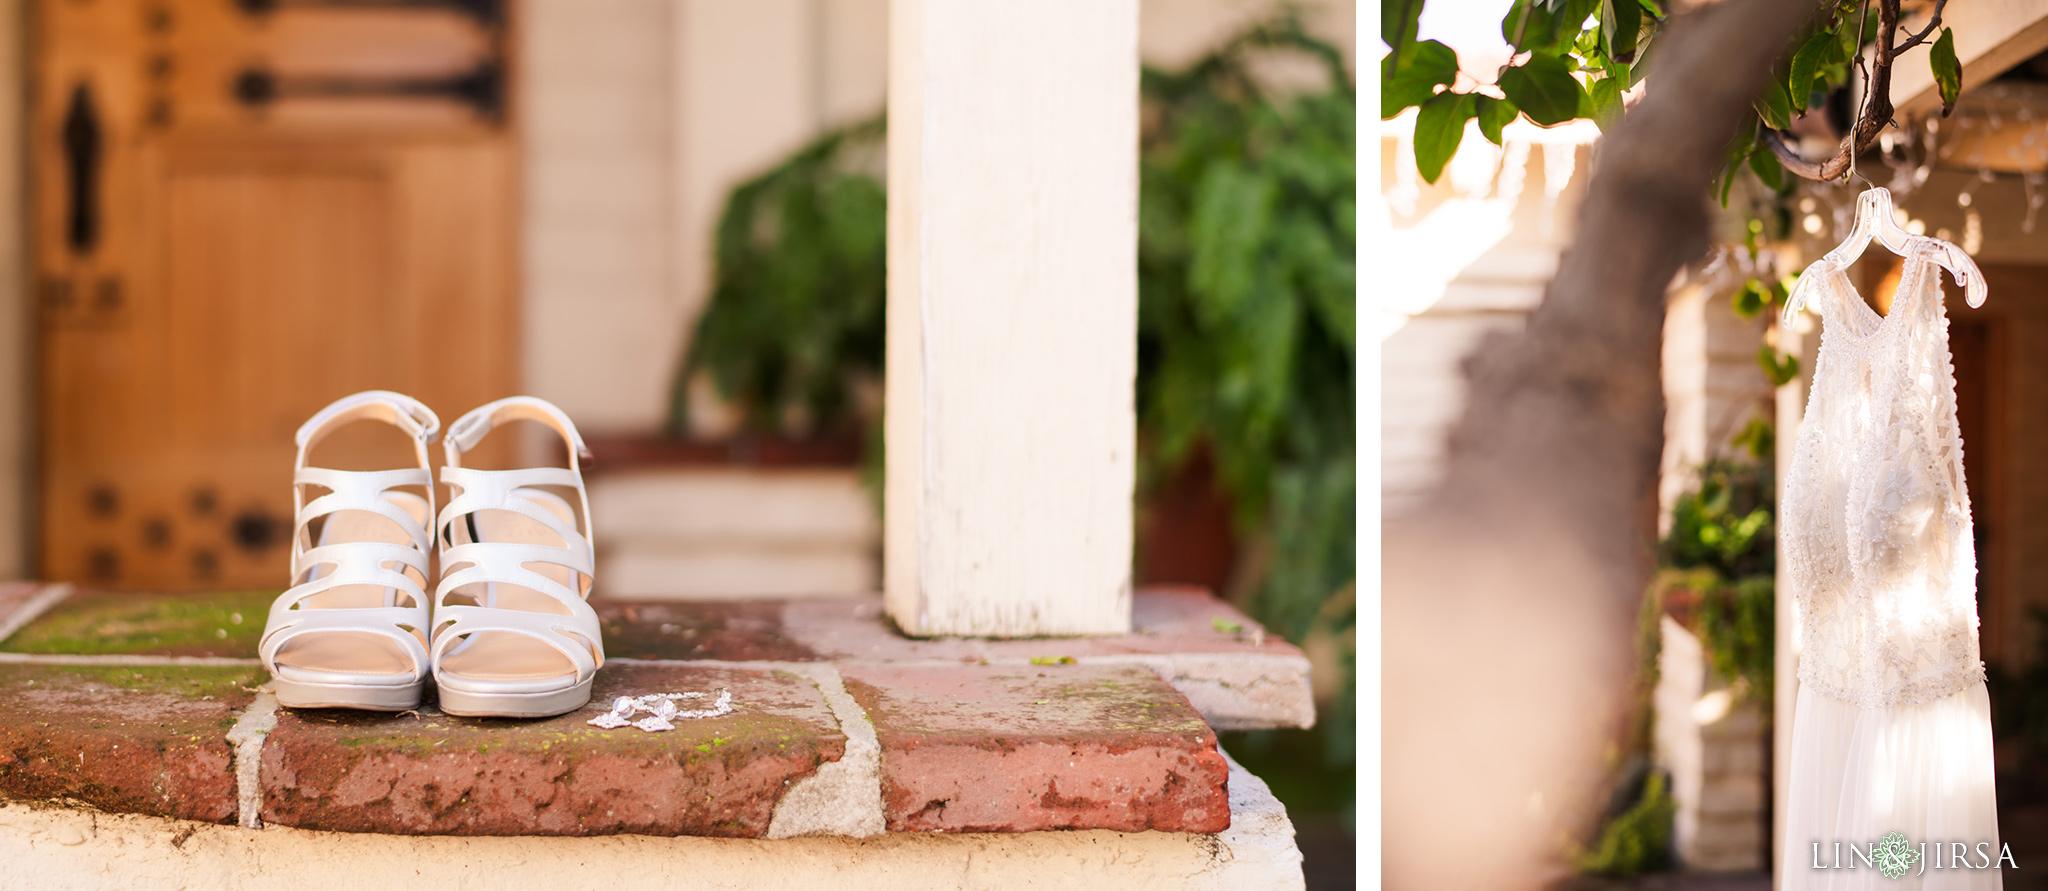 02 sherman library gardens orange county wedding photography